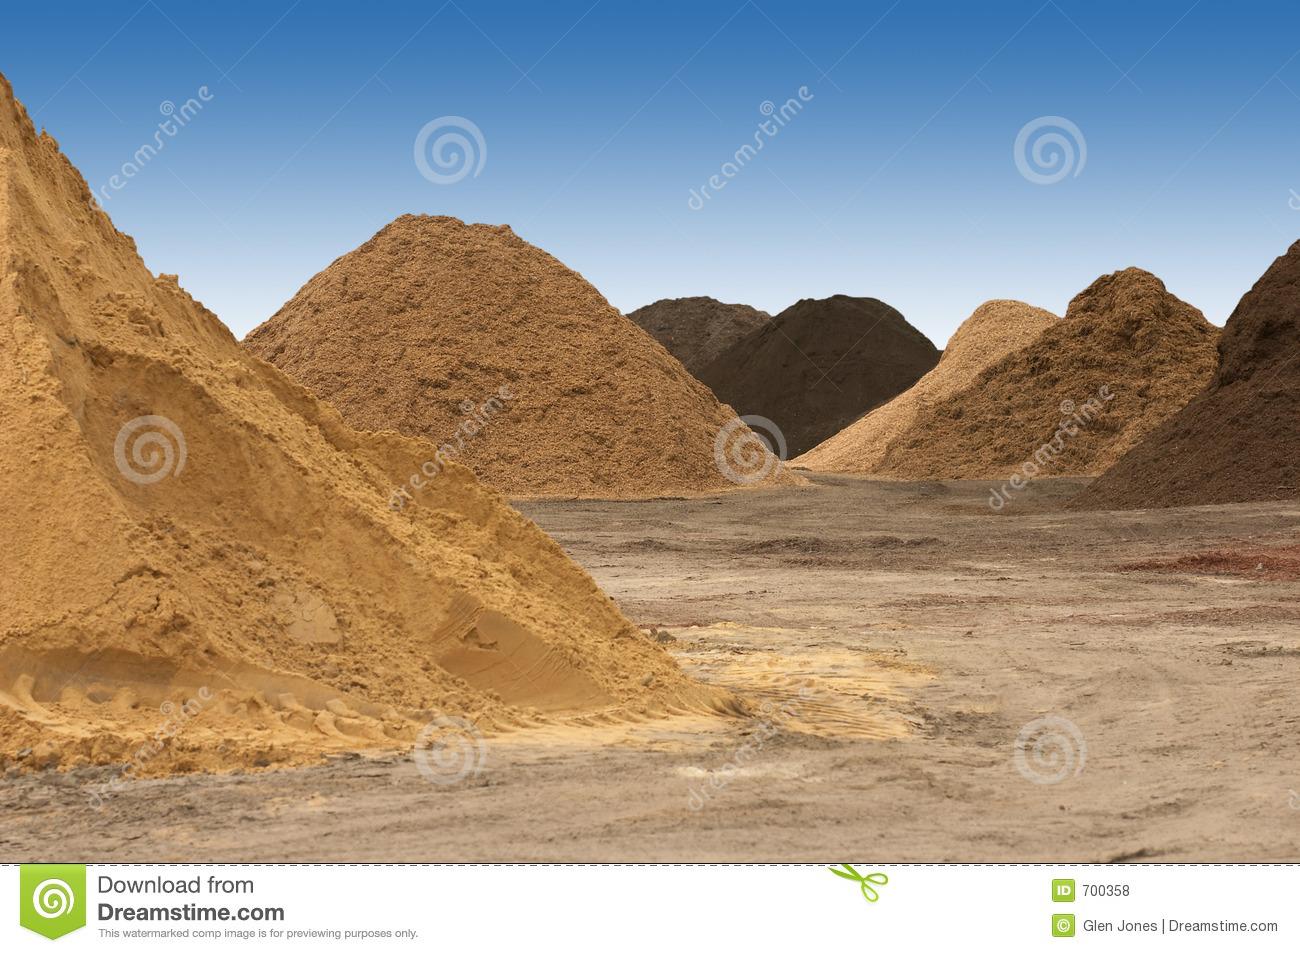 Dirt Pile Clipart.